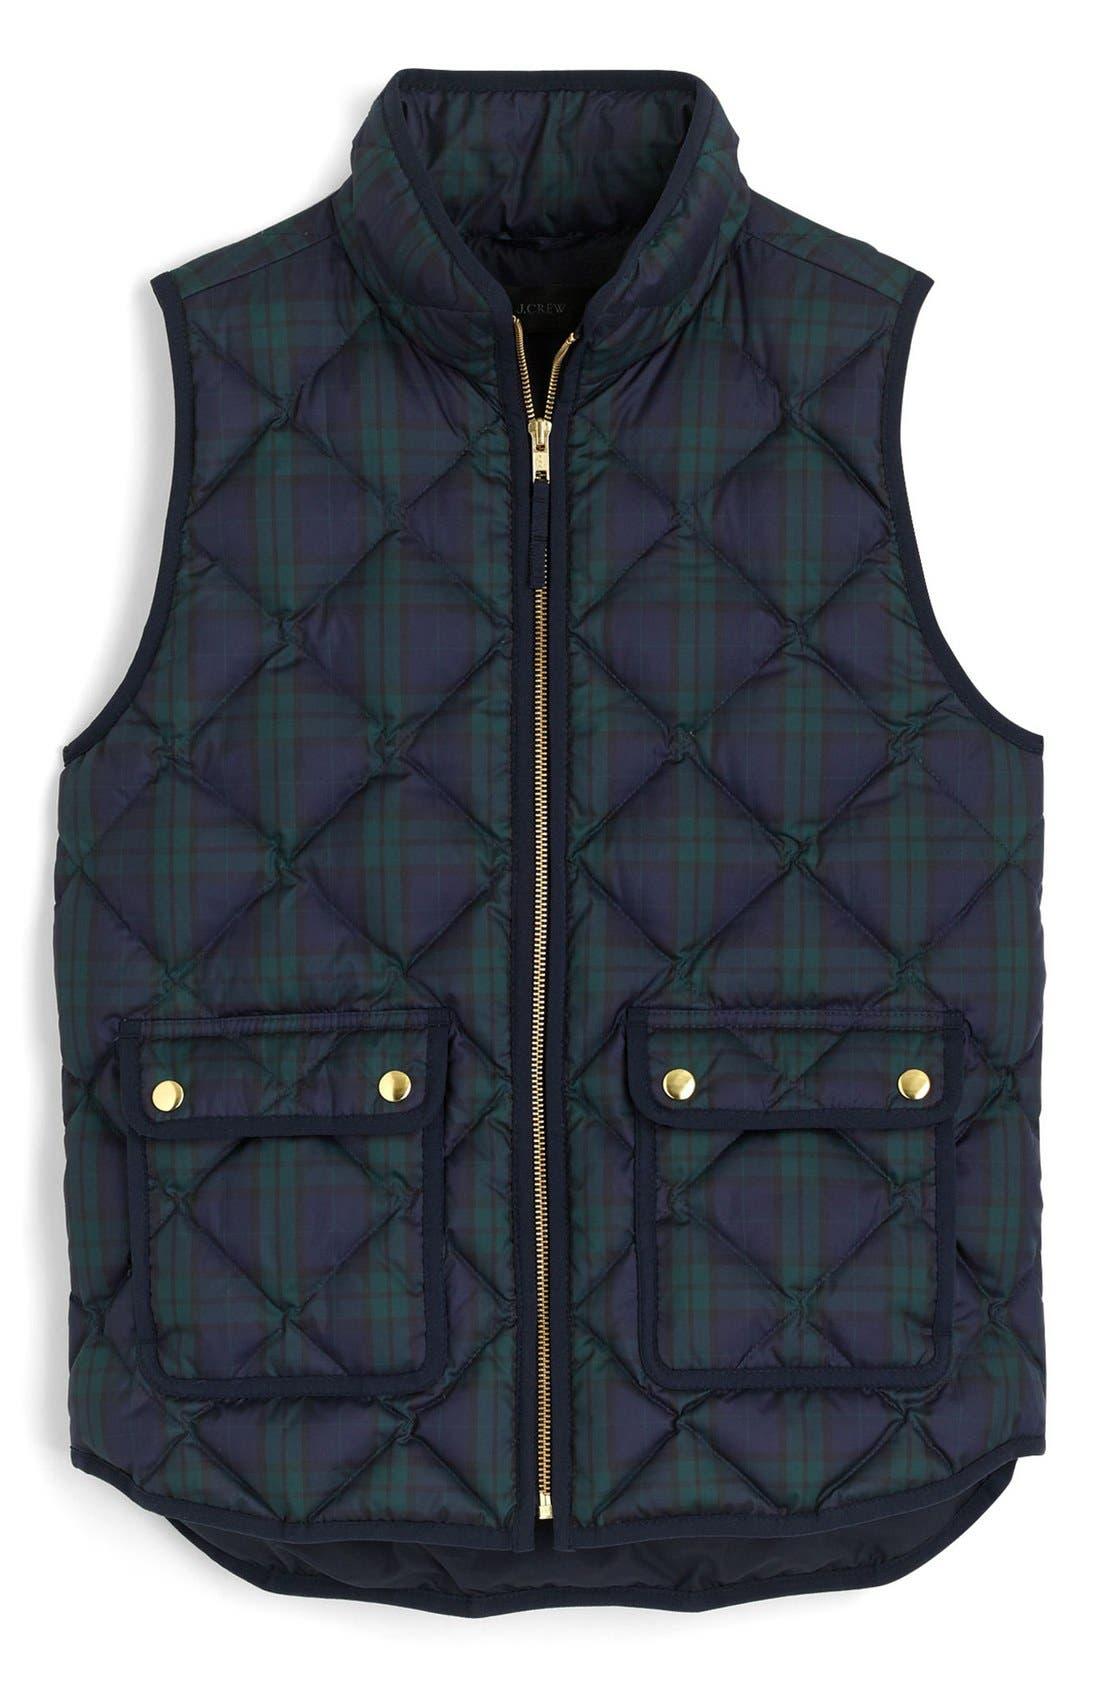 J.CREW,                             Black Watch Excursion Quilted Vest,                             Alternate thumbnail 3, color,                             301